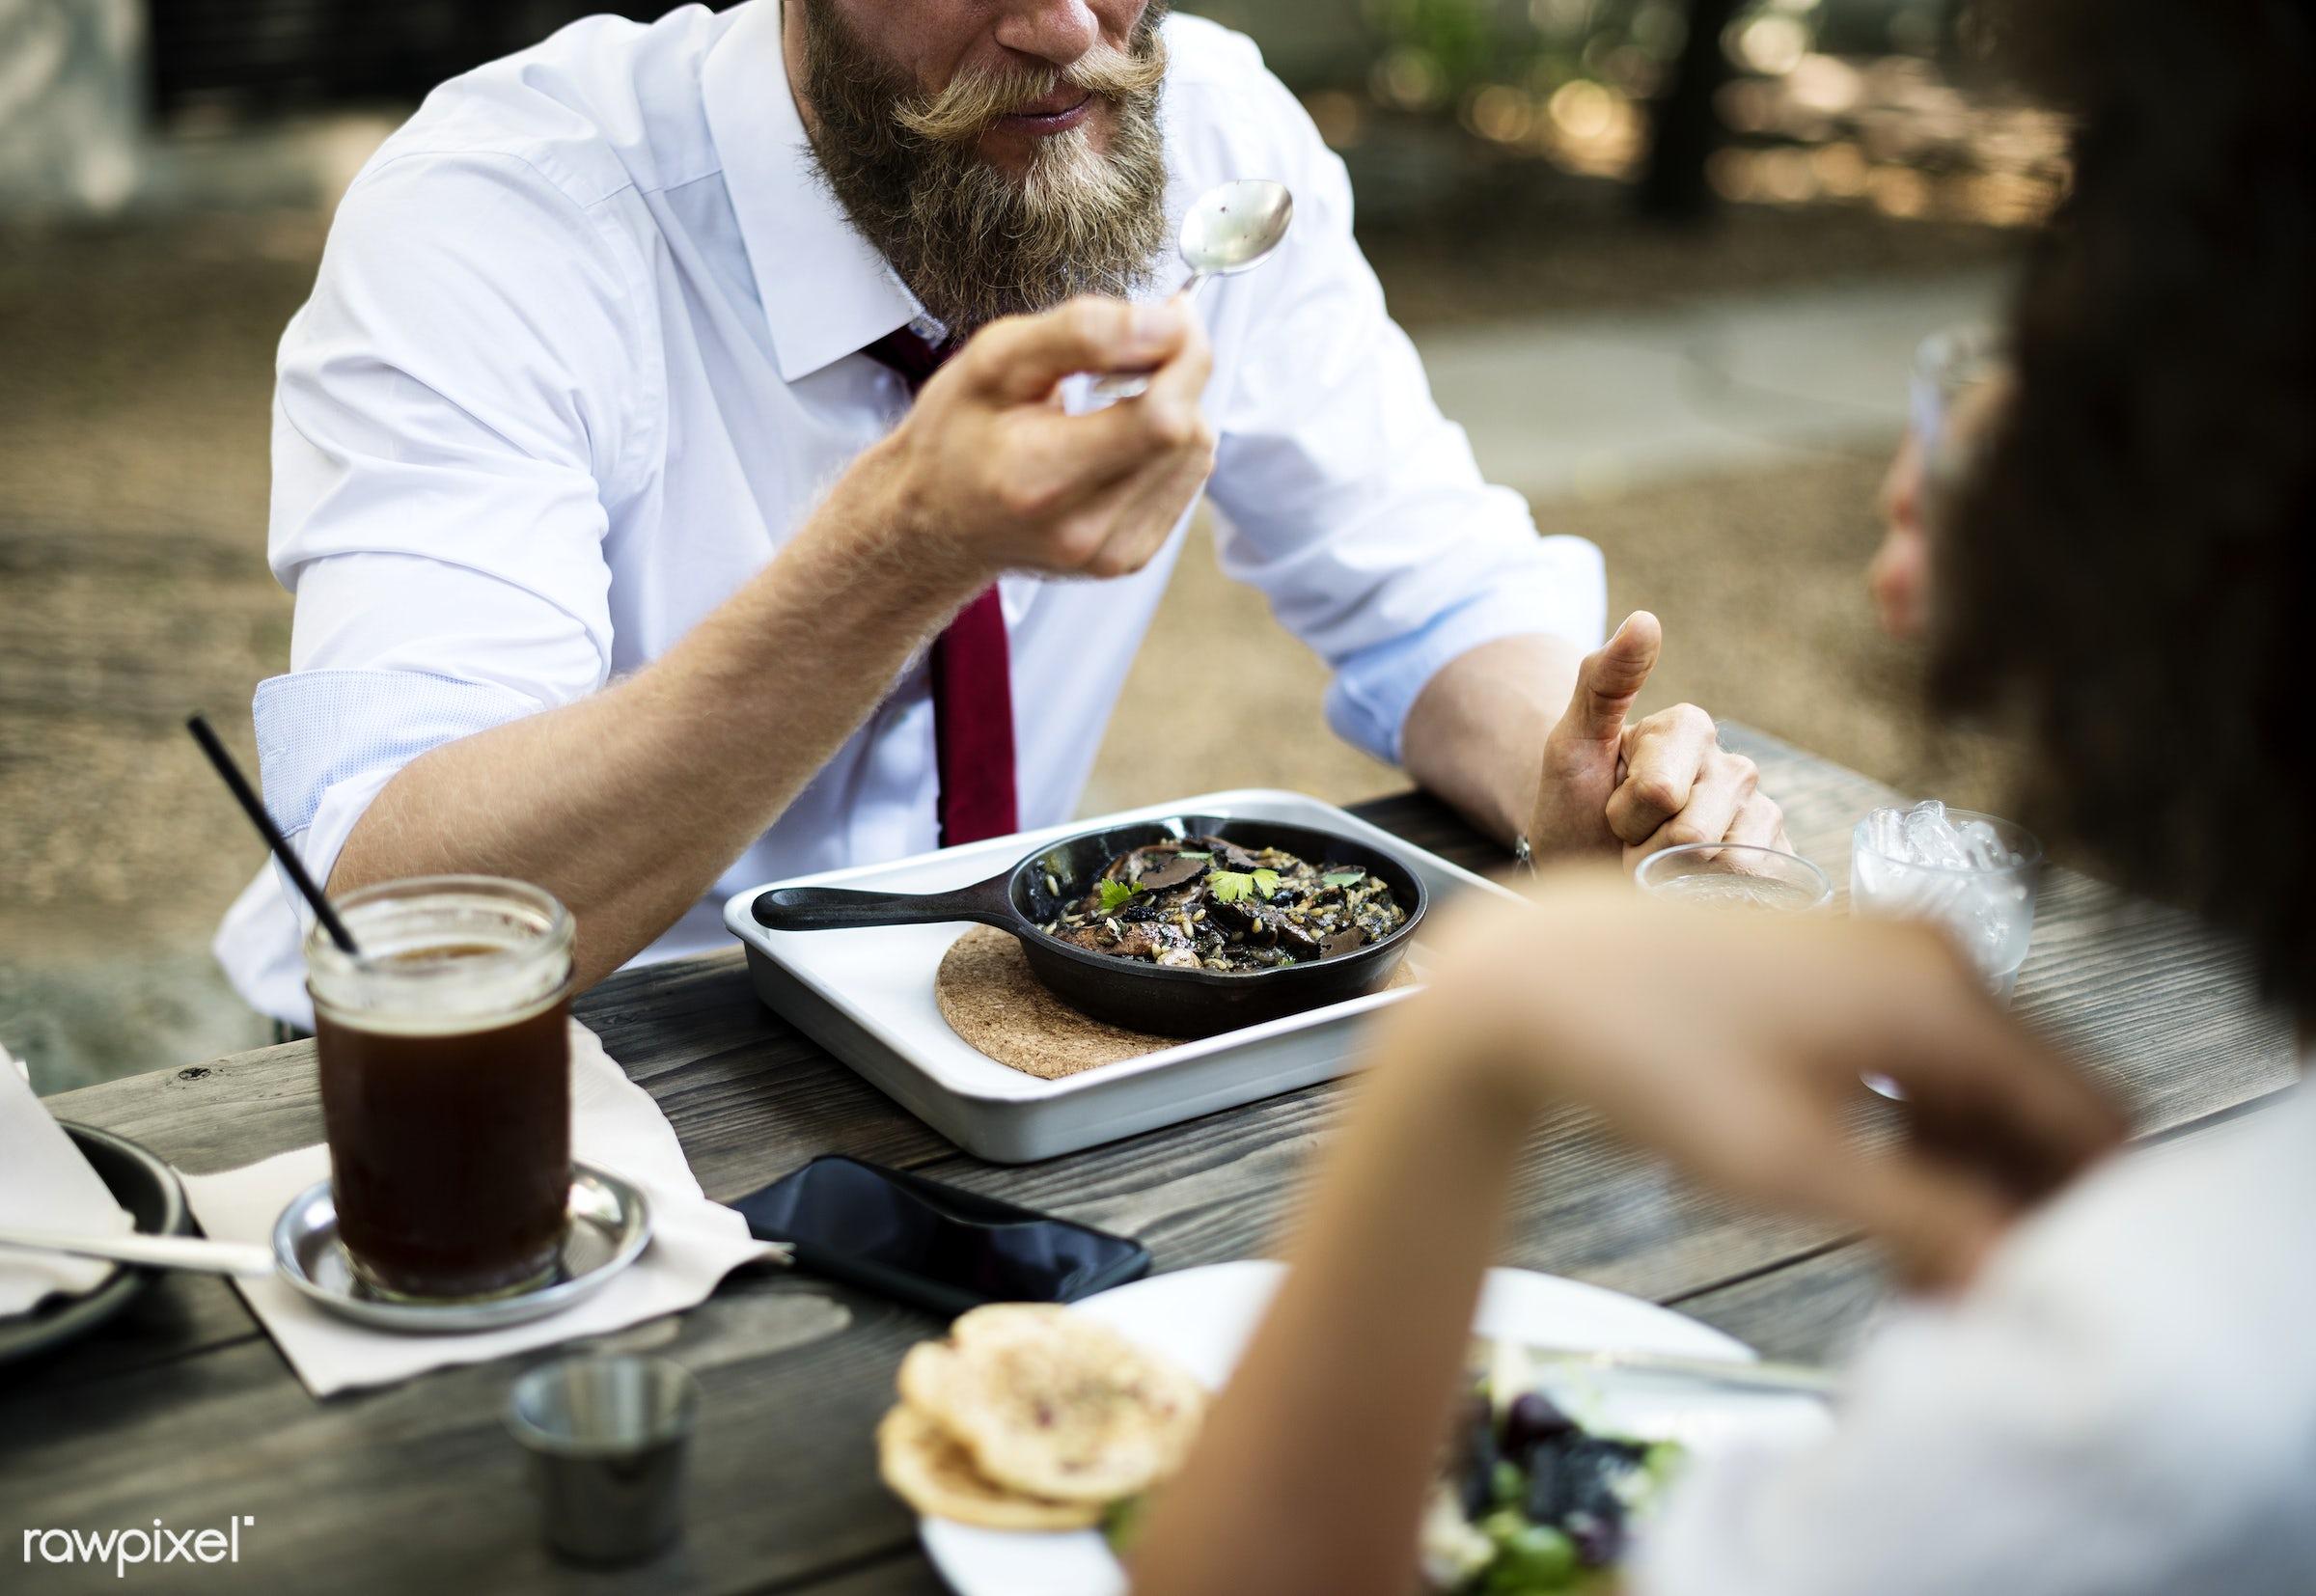 food, healthy, appetizer, beard, cafe, cc0, couple, creative common 0, creative commons 0, cuisine, culinary, eating,...